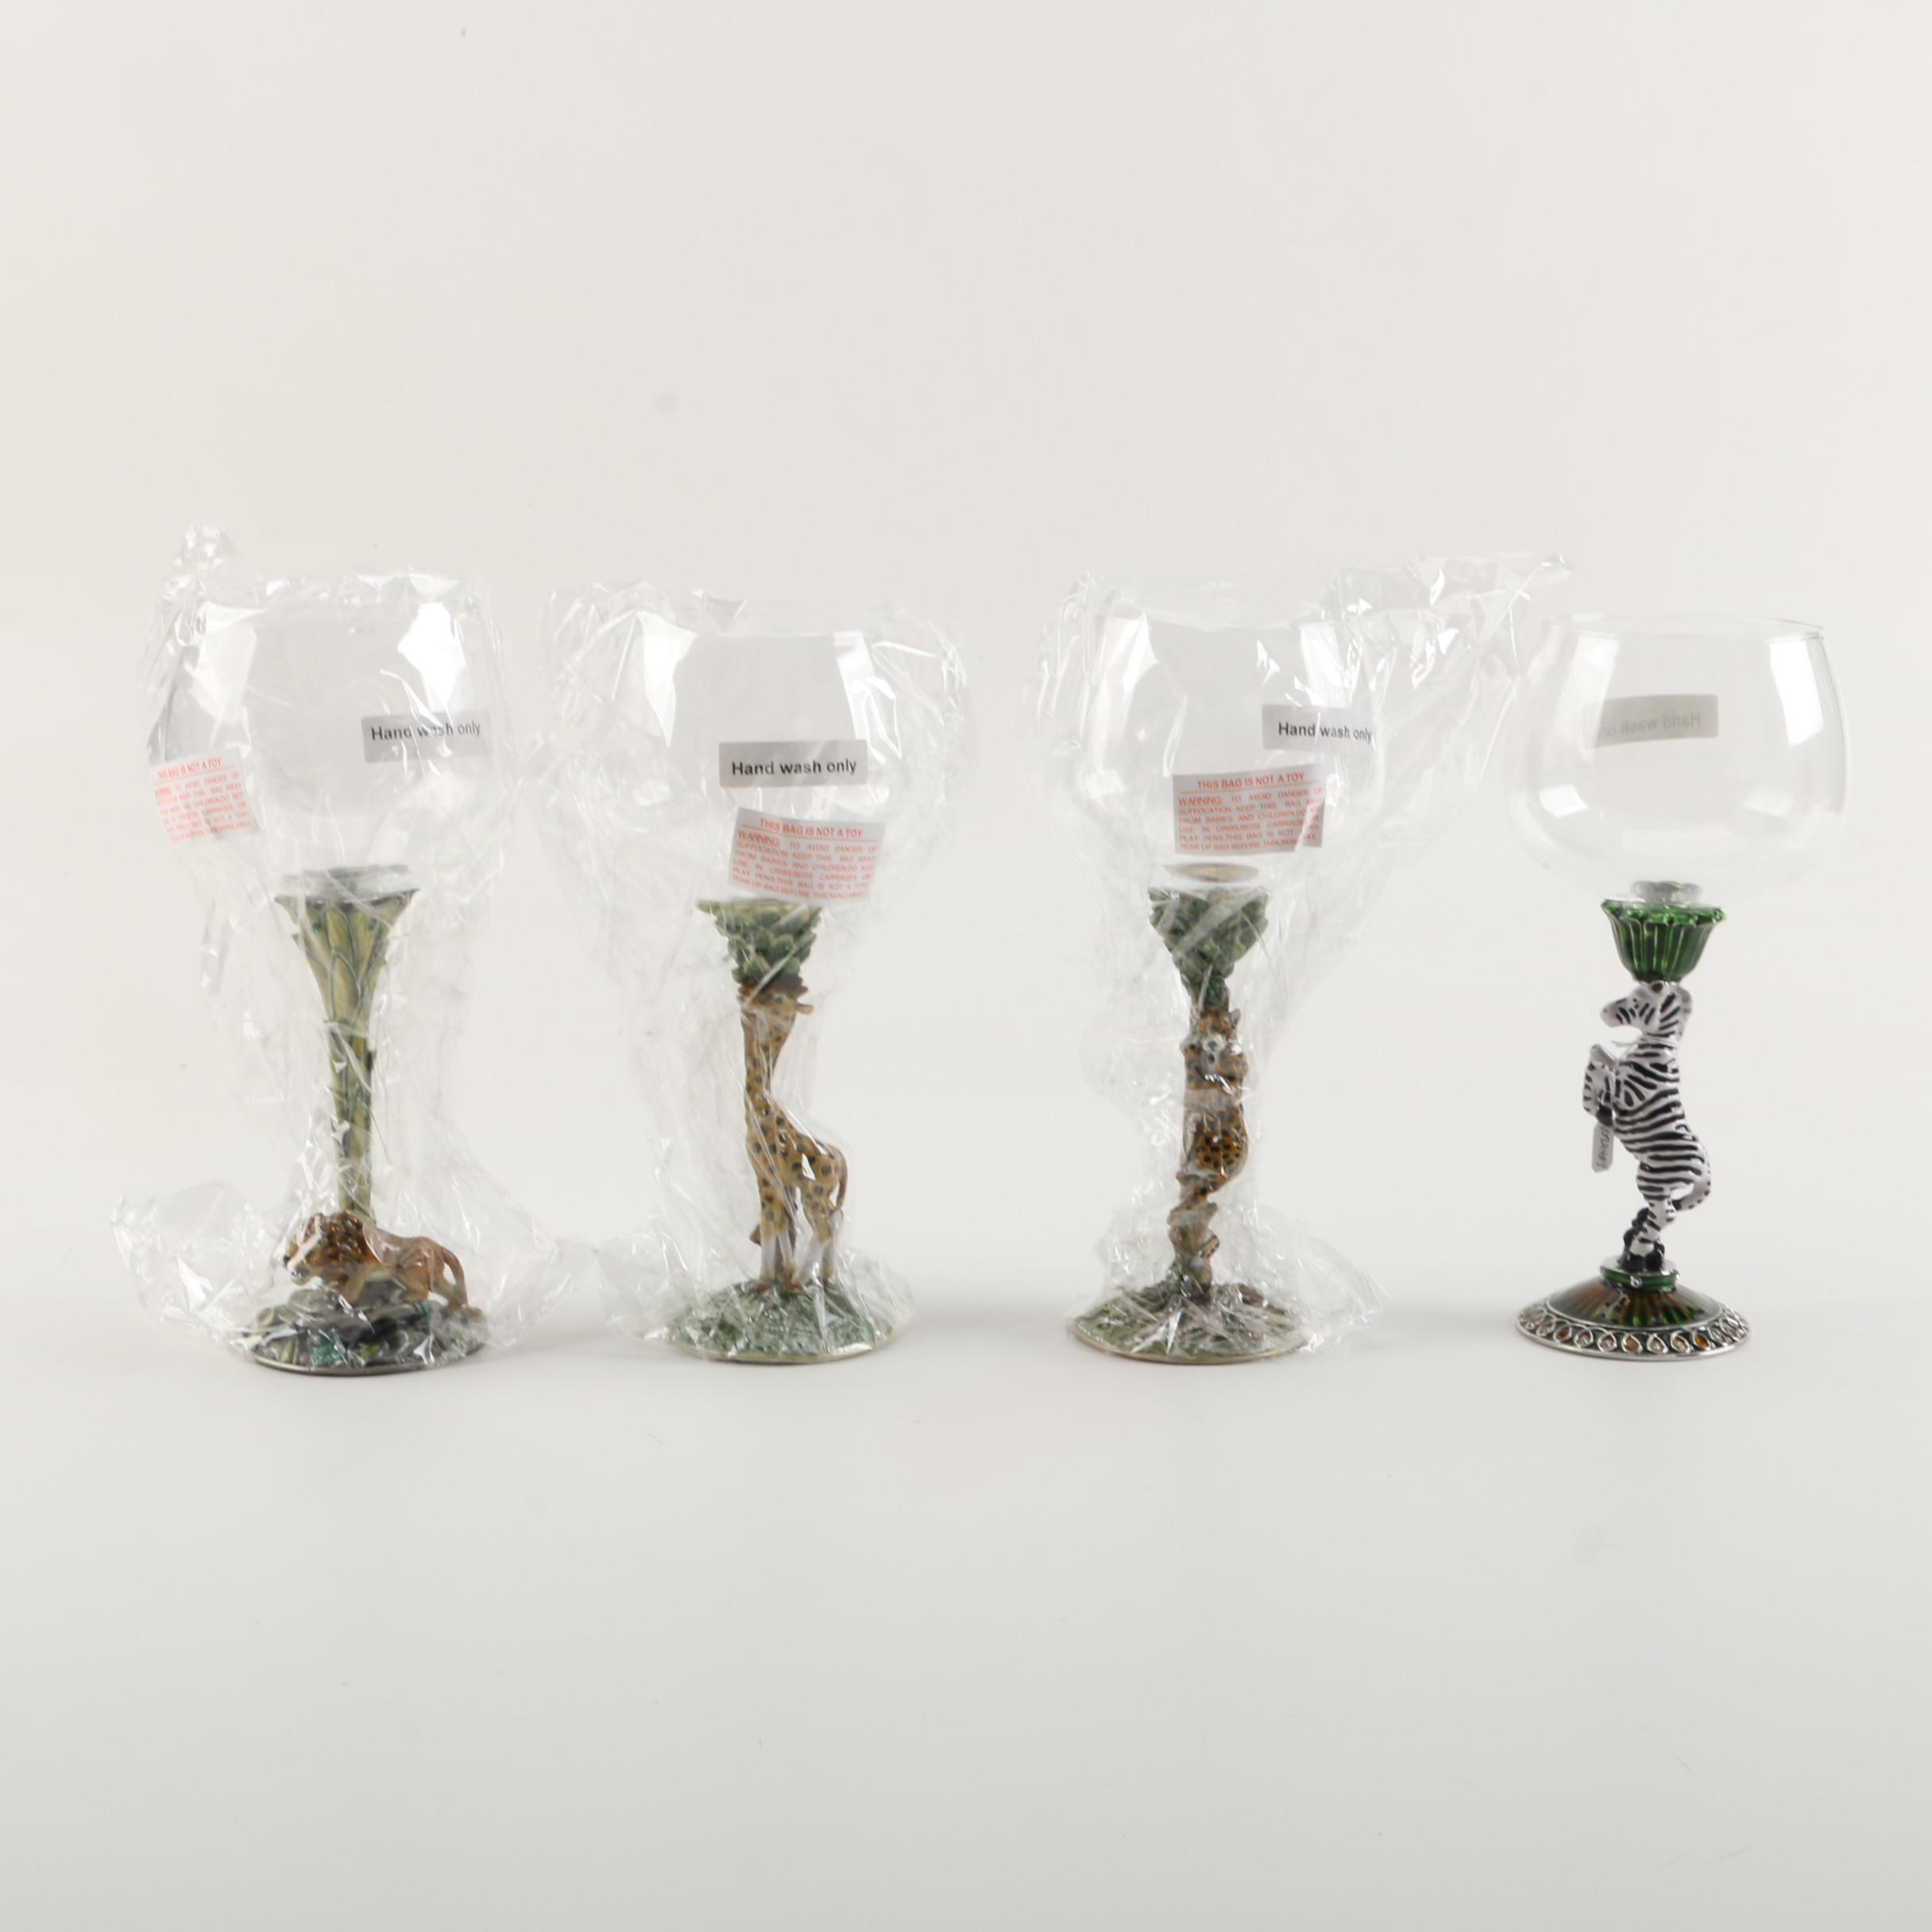 Animal Themed Wine Glasses by Jeré